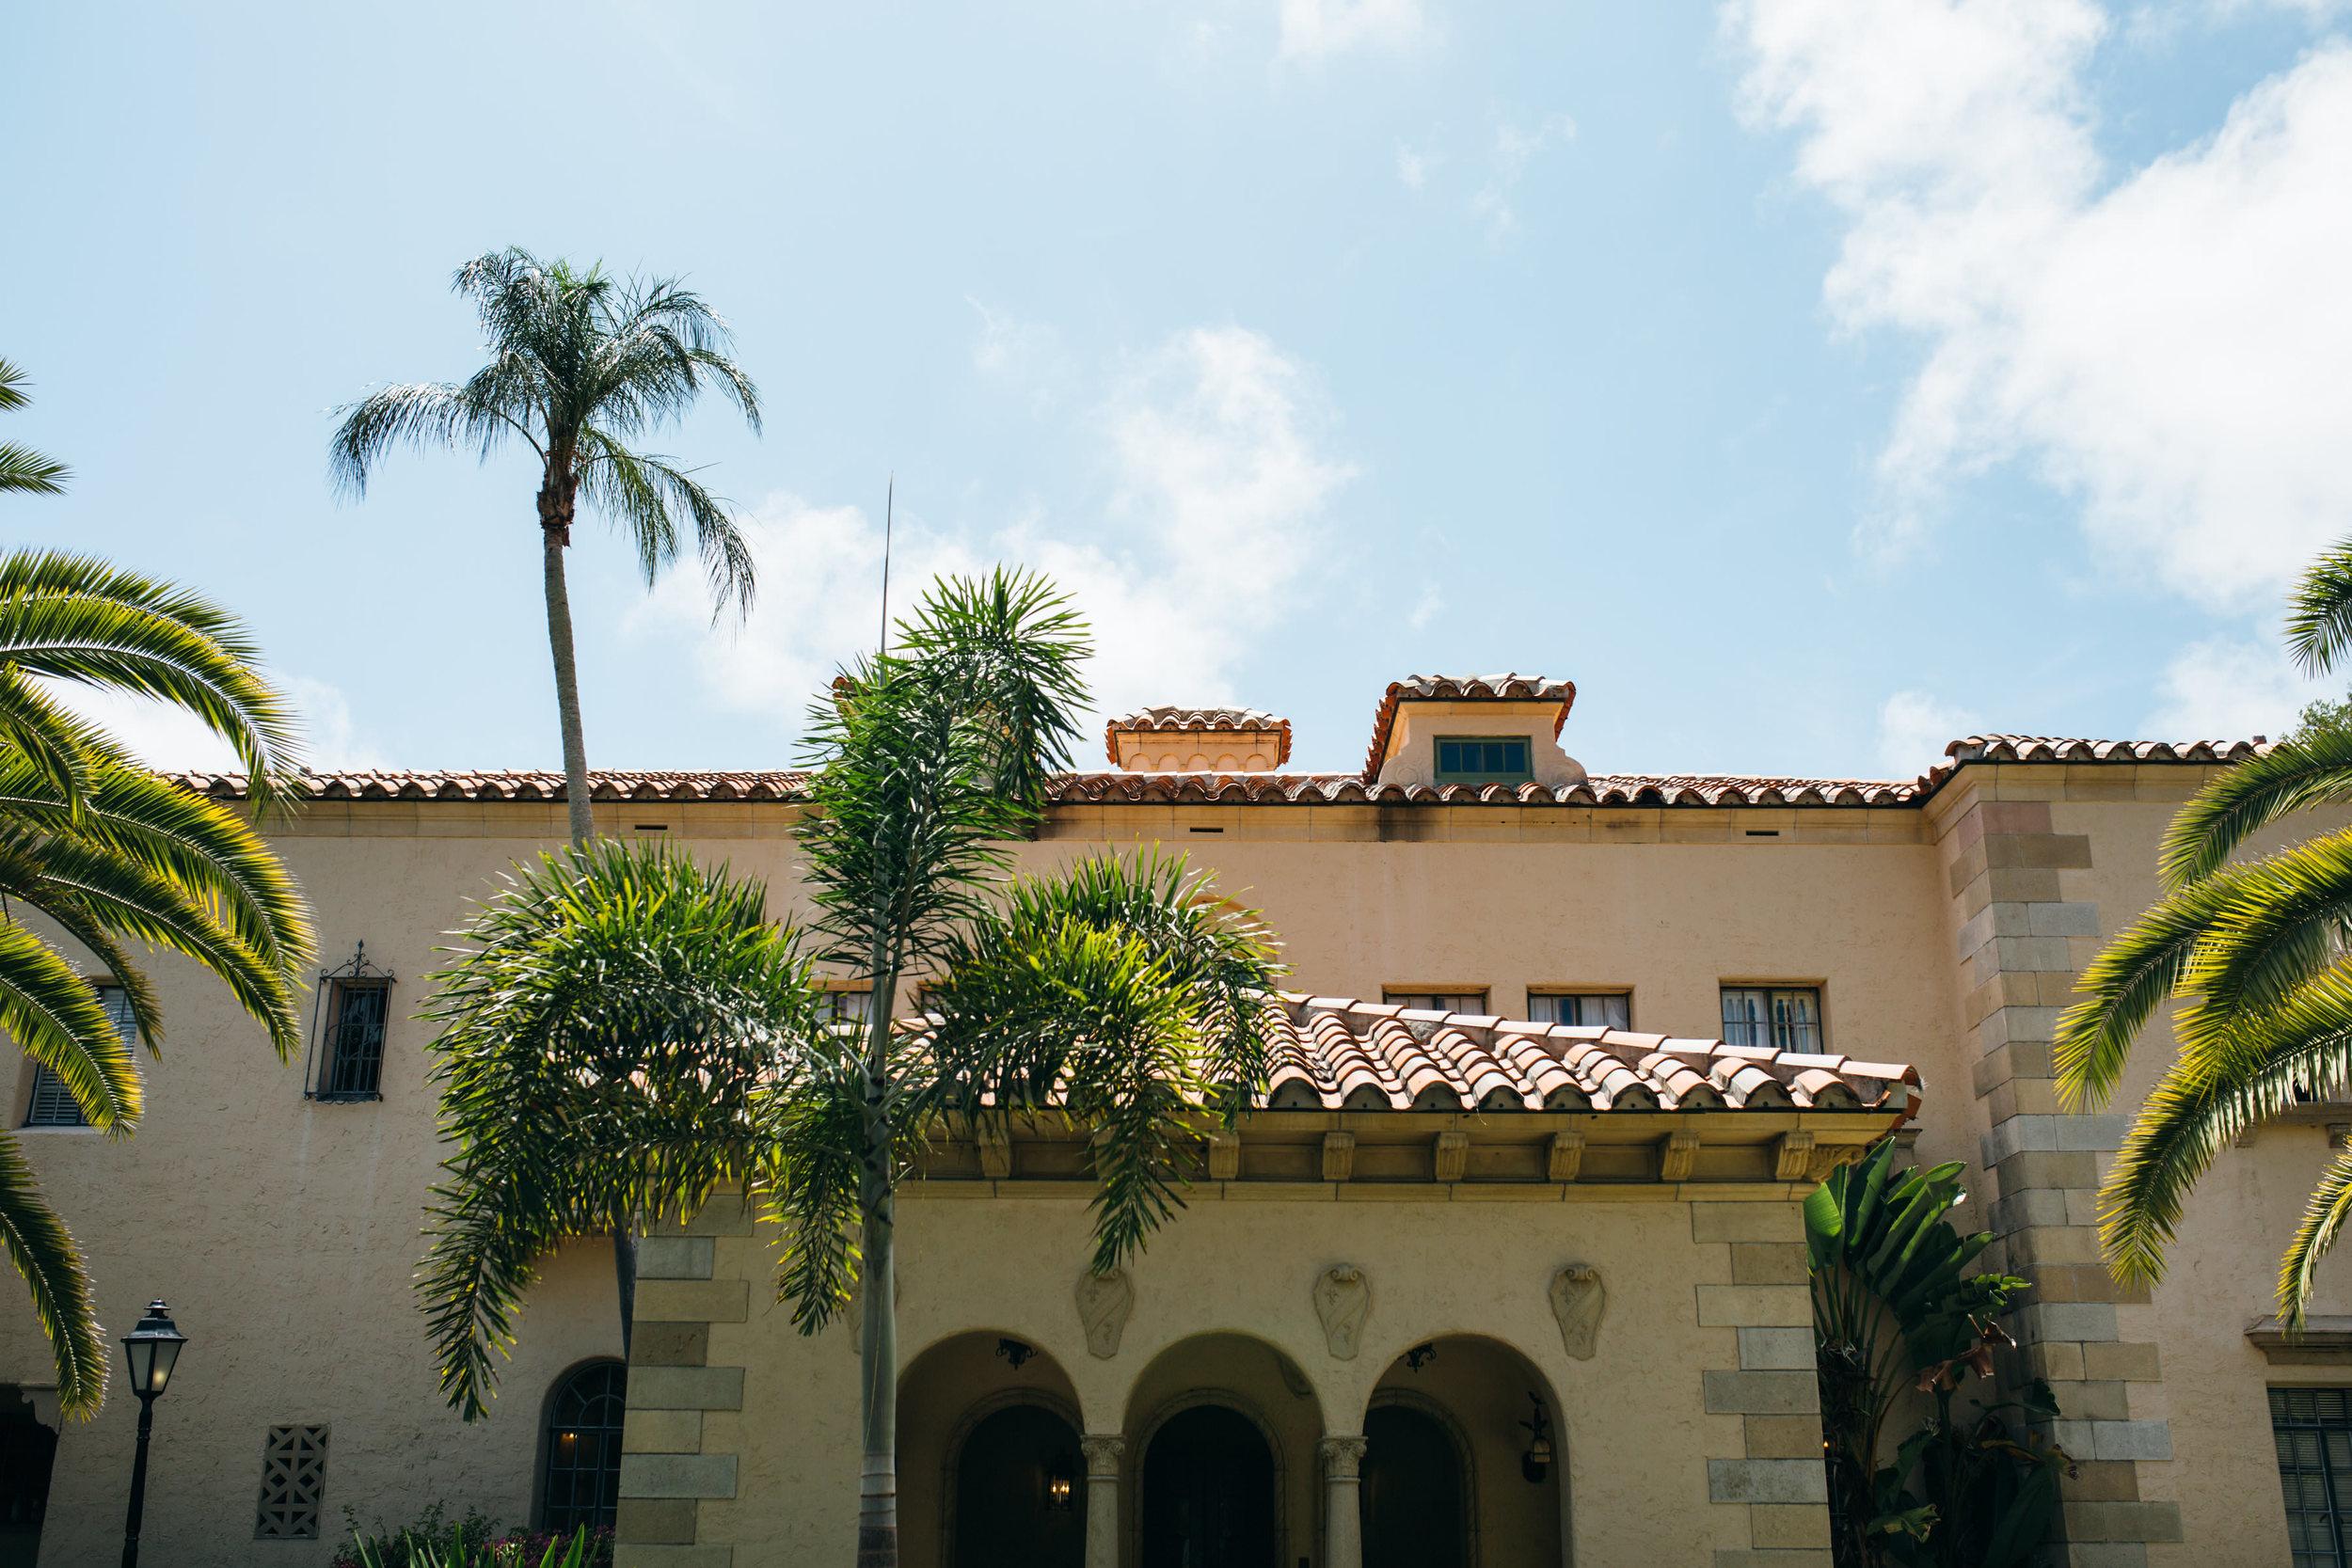 Powel Crosley Estate Wedding   Sarasota, Florida   Benjamin Hewitt Photography